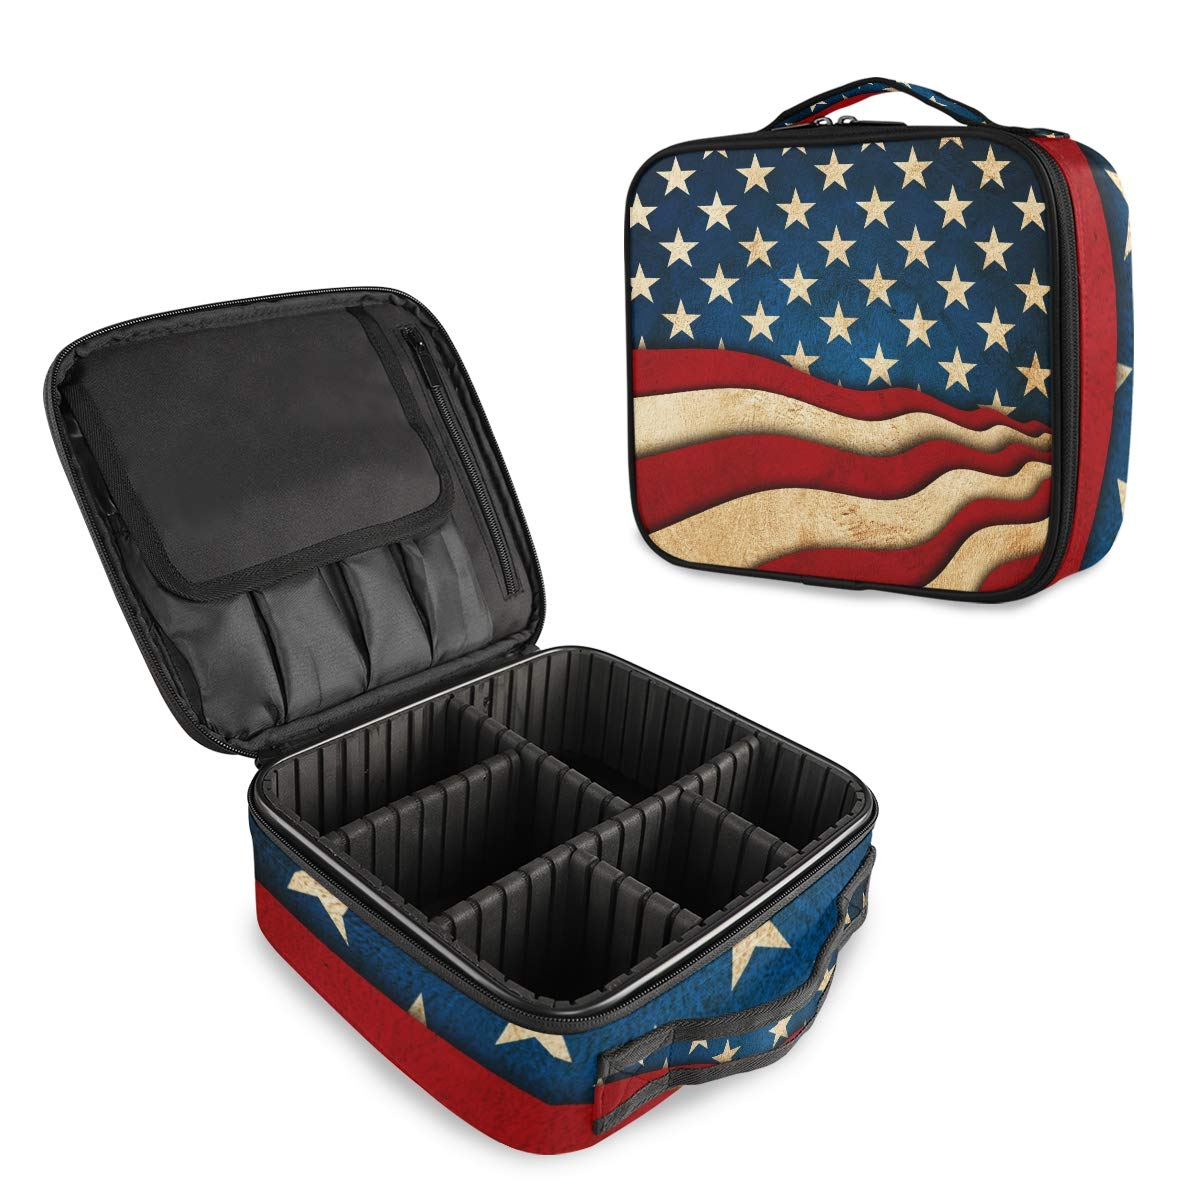 HousingMart Very popular! Rapid rise Travel Makeup Bag American Vintage Cosme Flag